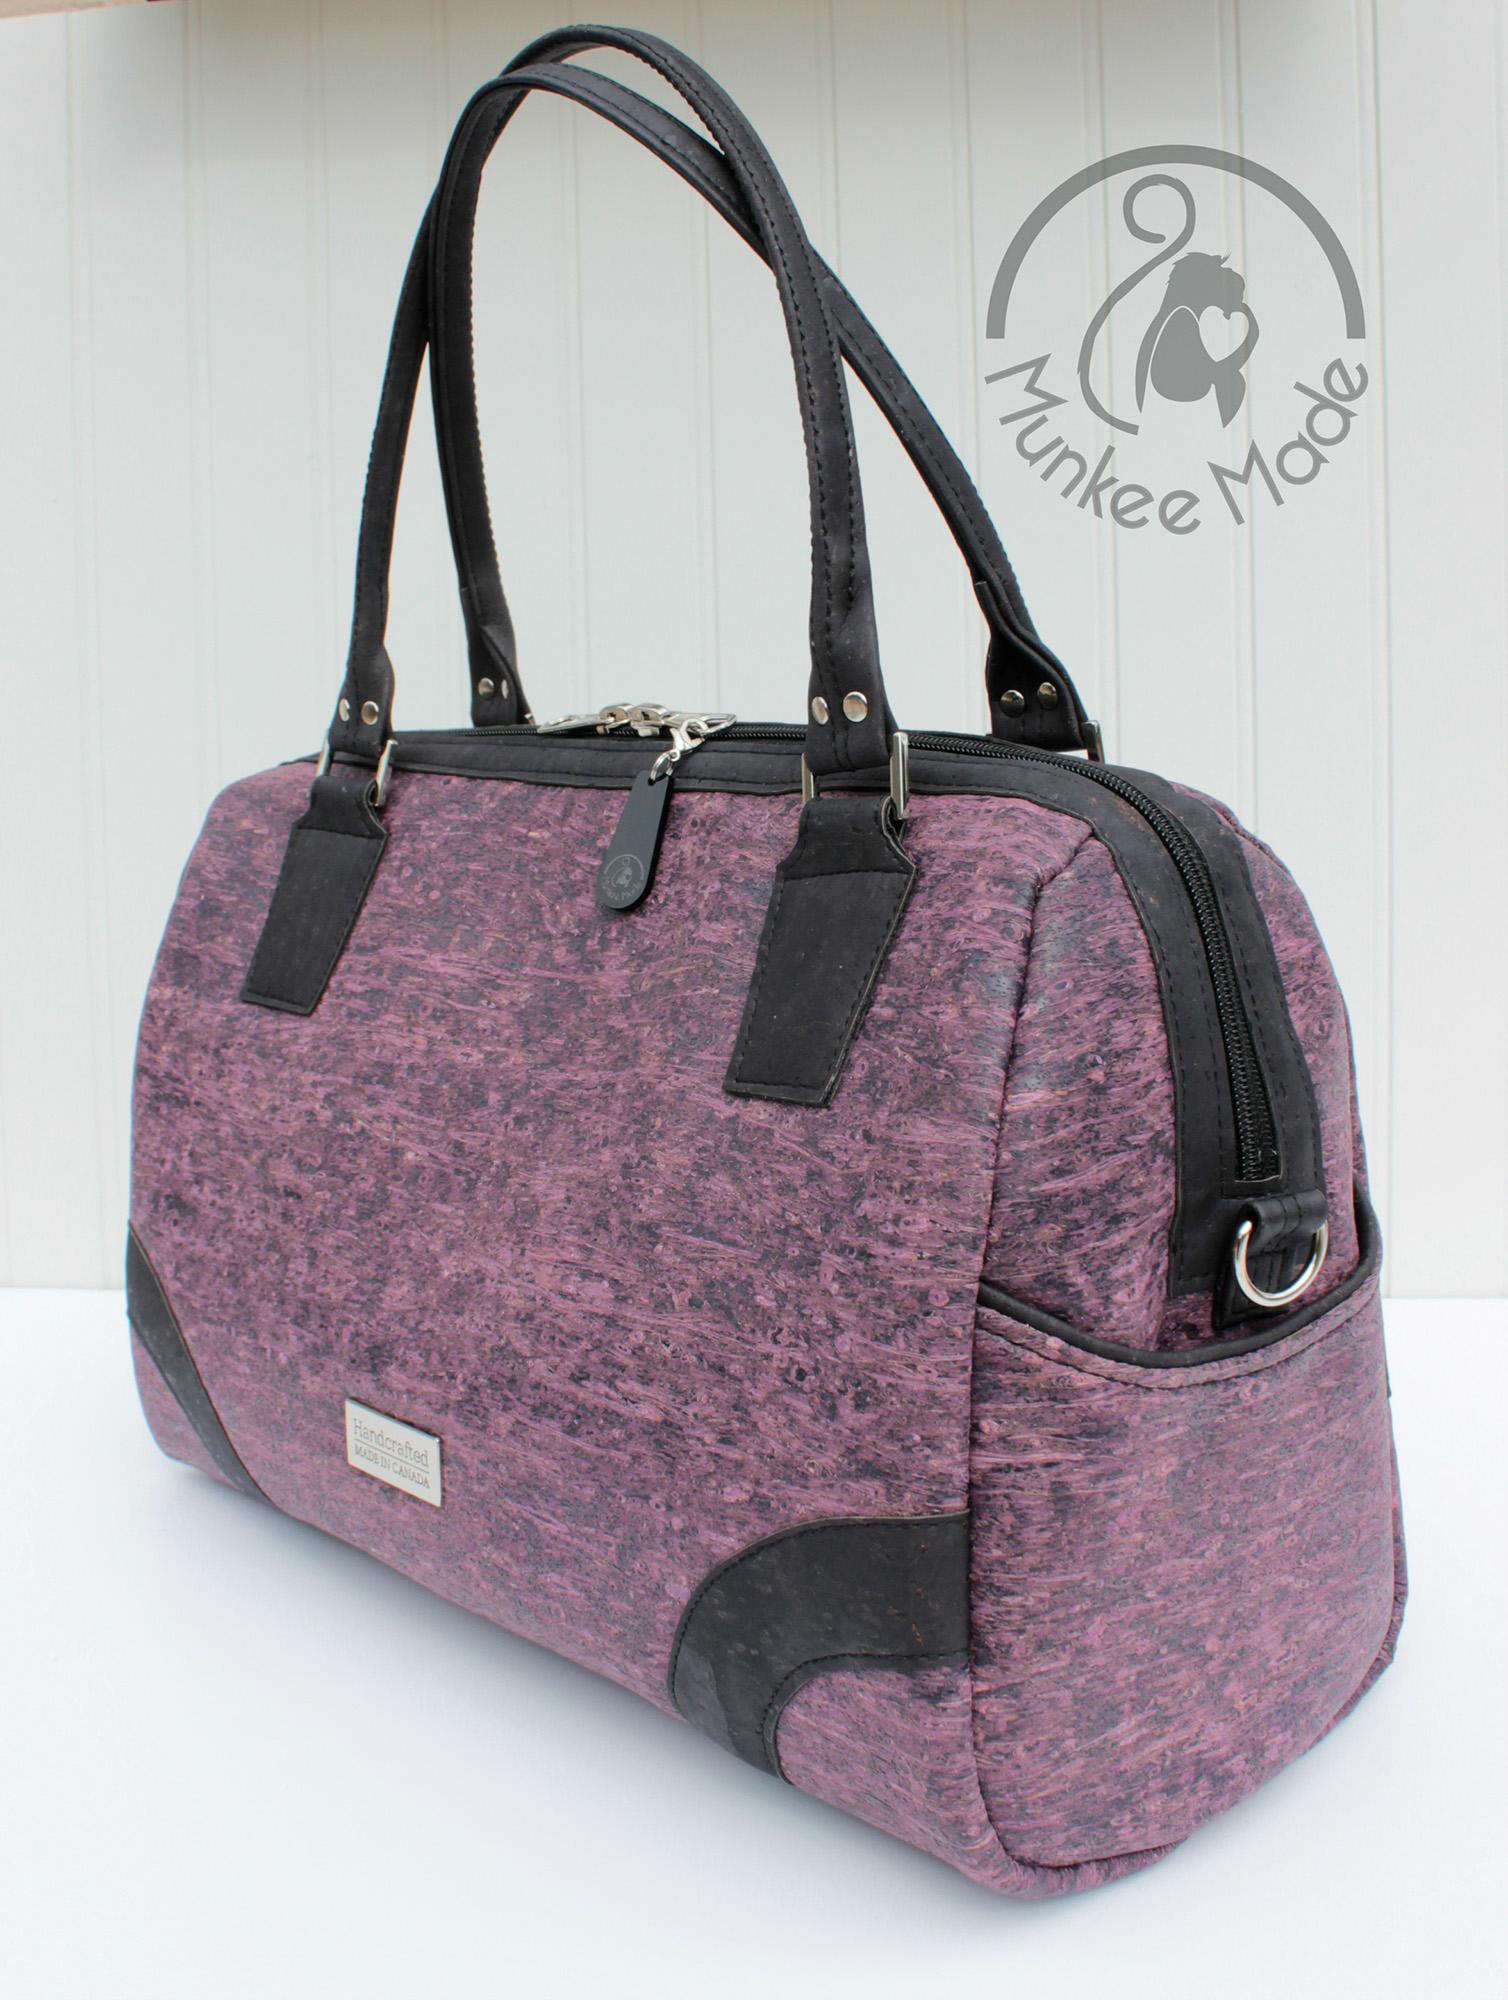 Sew Sweetness Coalition Bag sewing pattern, sewn by Sheri of Munkee Made